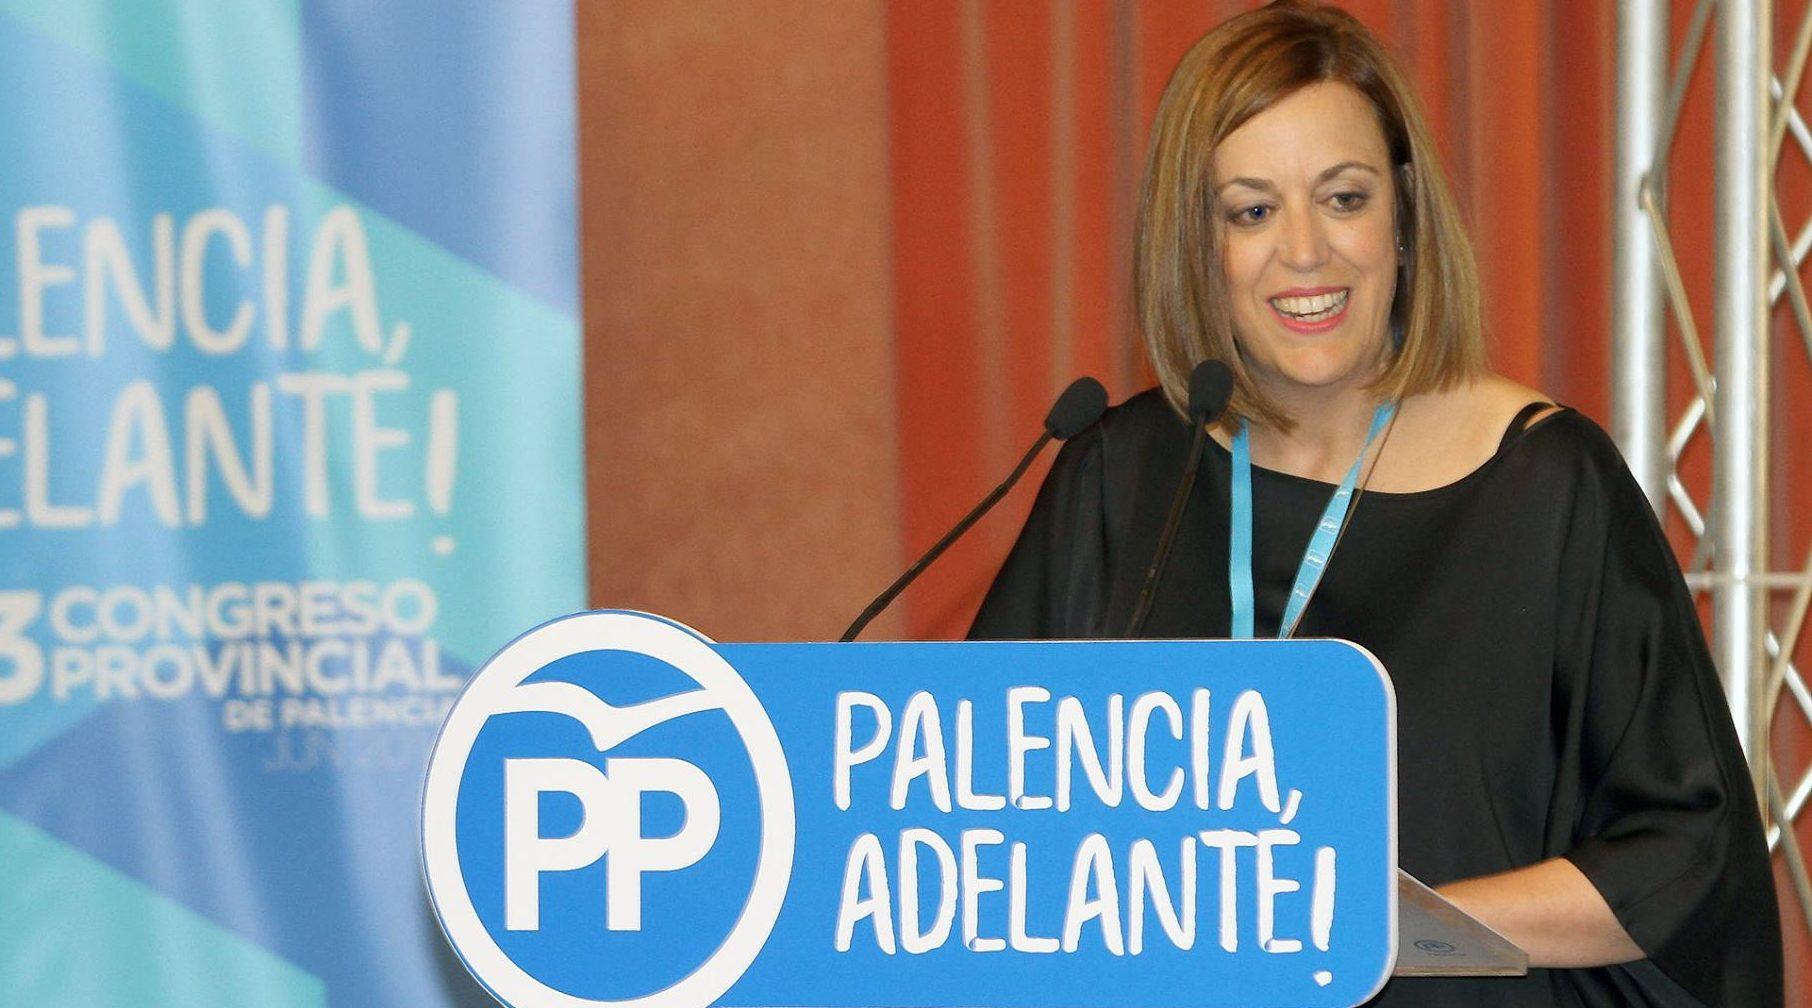 Ángles Armisén, Presidenta del Partido Popular de Palencia